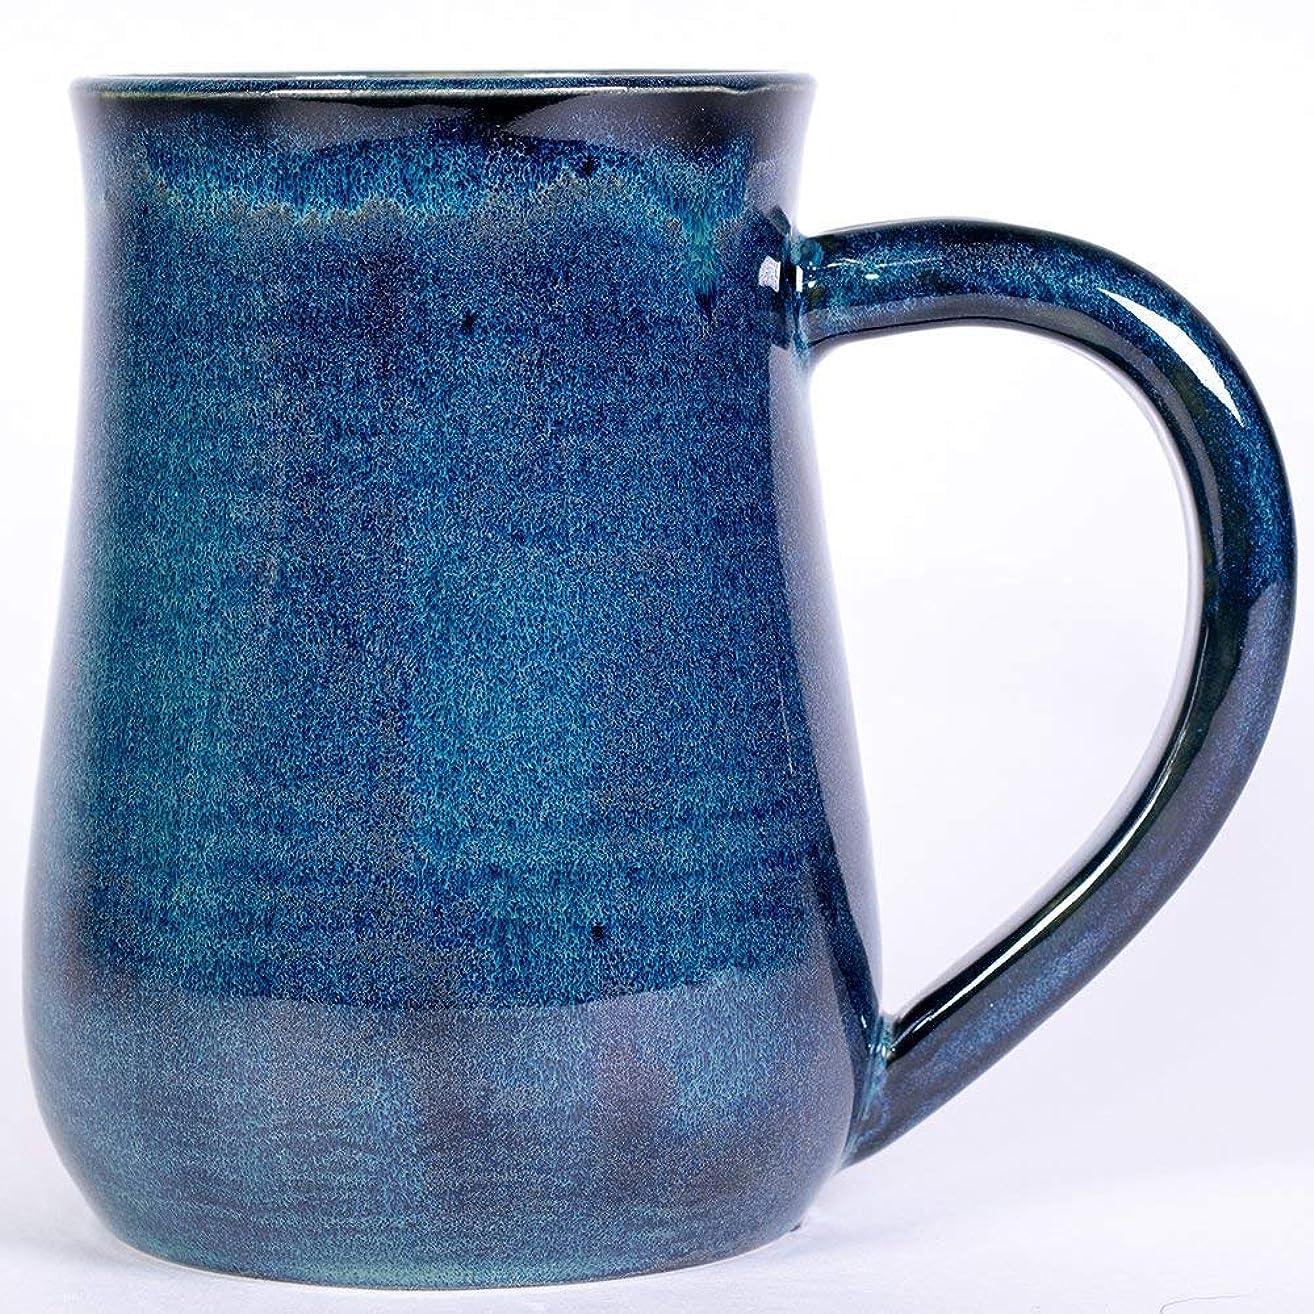 Blue and Green Handmade Pottery Mug